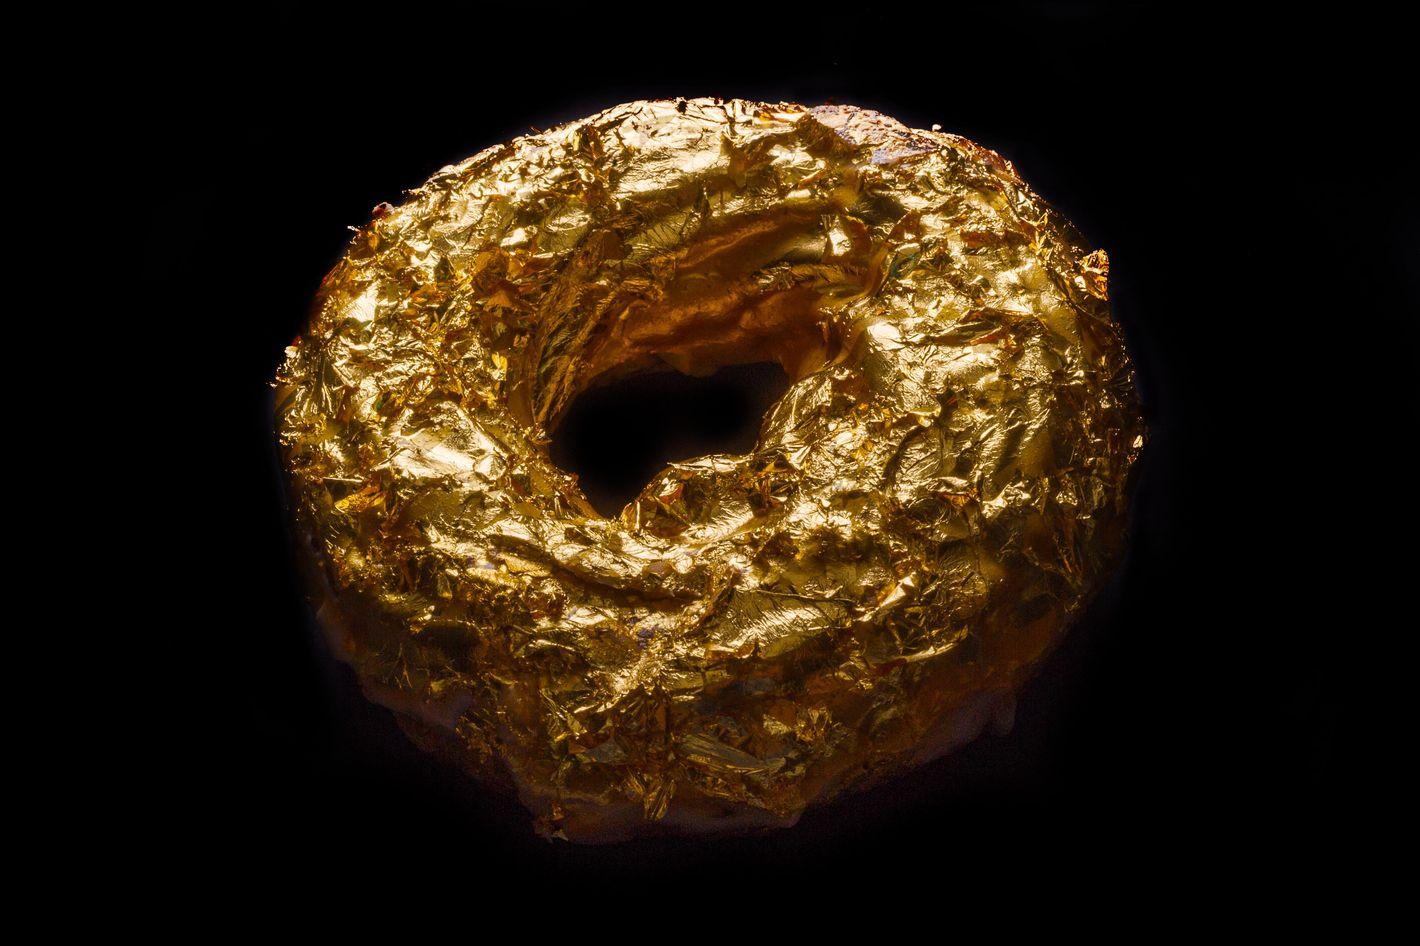 What a $100 doughnut needs to look like.